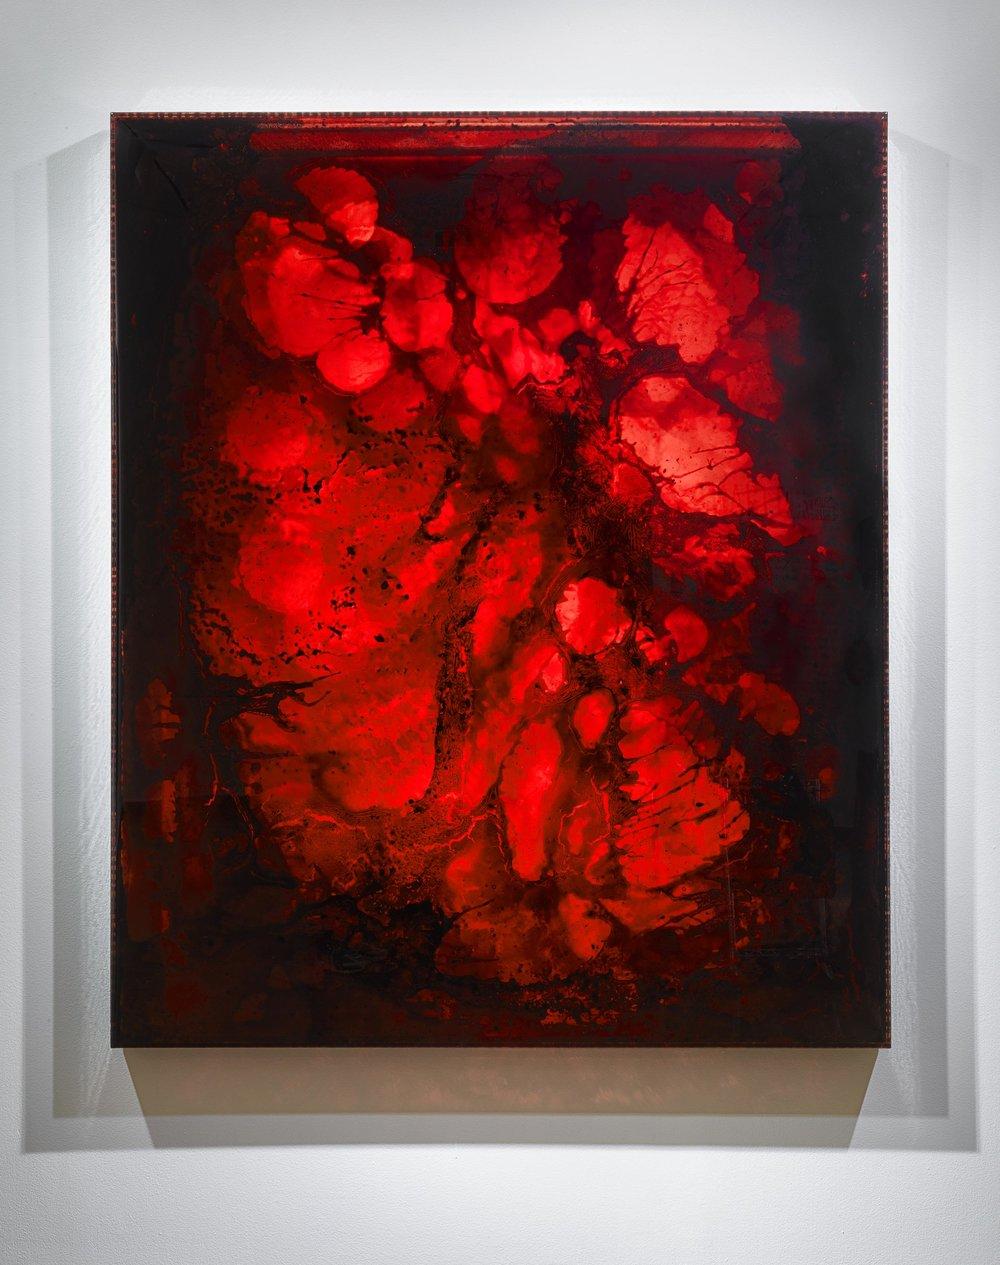 "LIFE FORCE 2012-2 ,  2012  72 x 60 x 3""  blood, copper, preserved on plexiglass, UV resin"